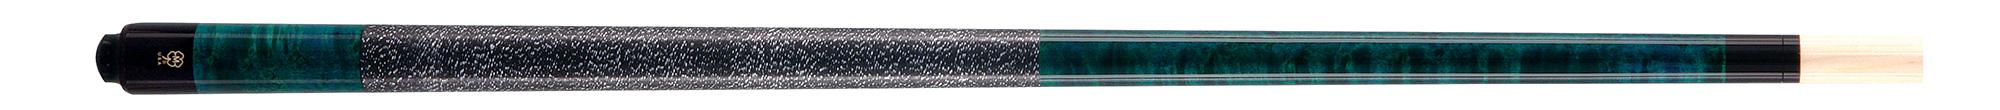 PK3062: McDermott GS08 DW blue/green pool #1